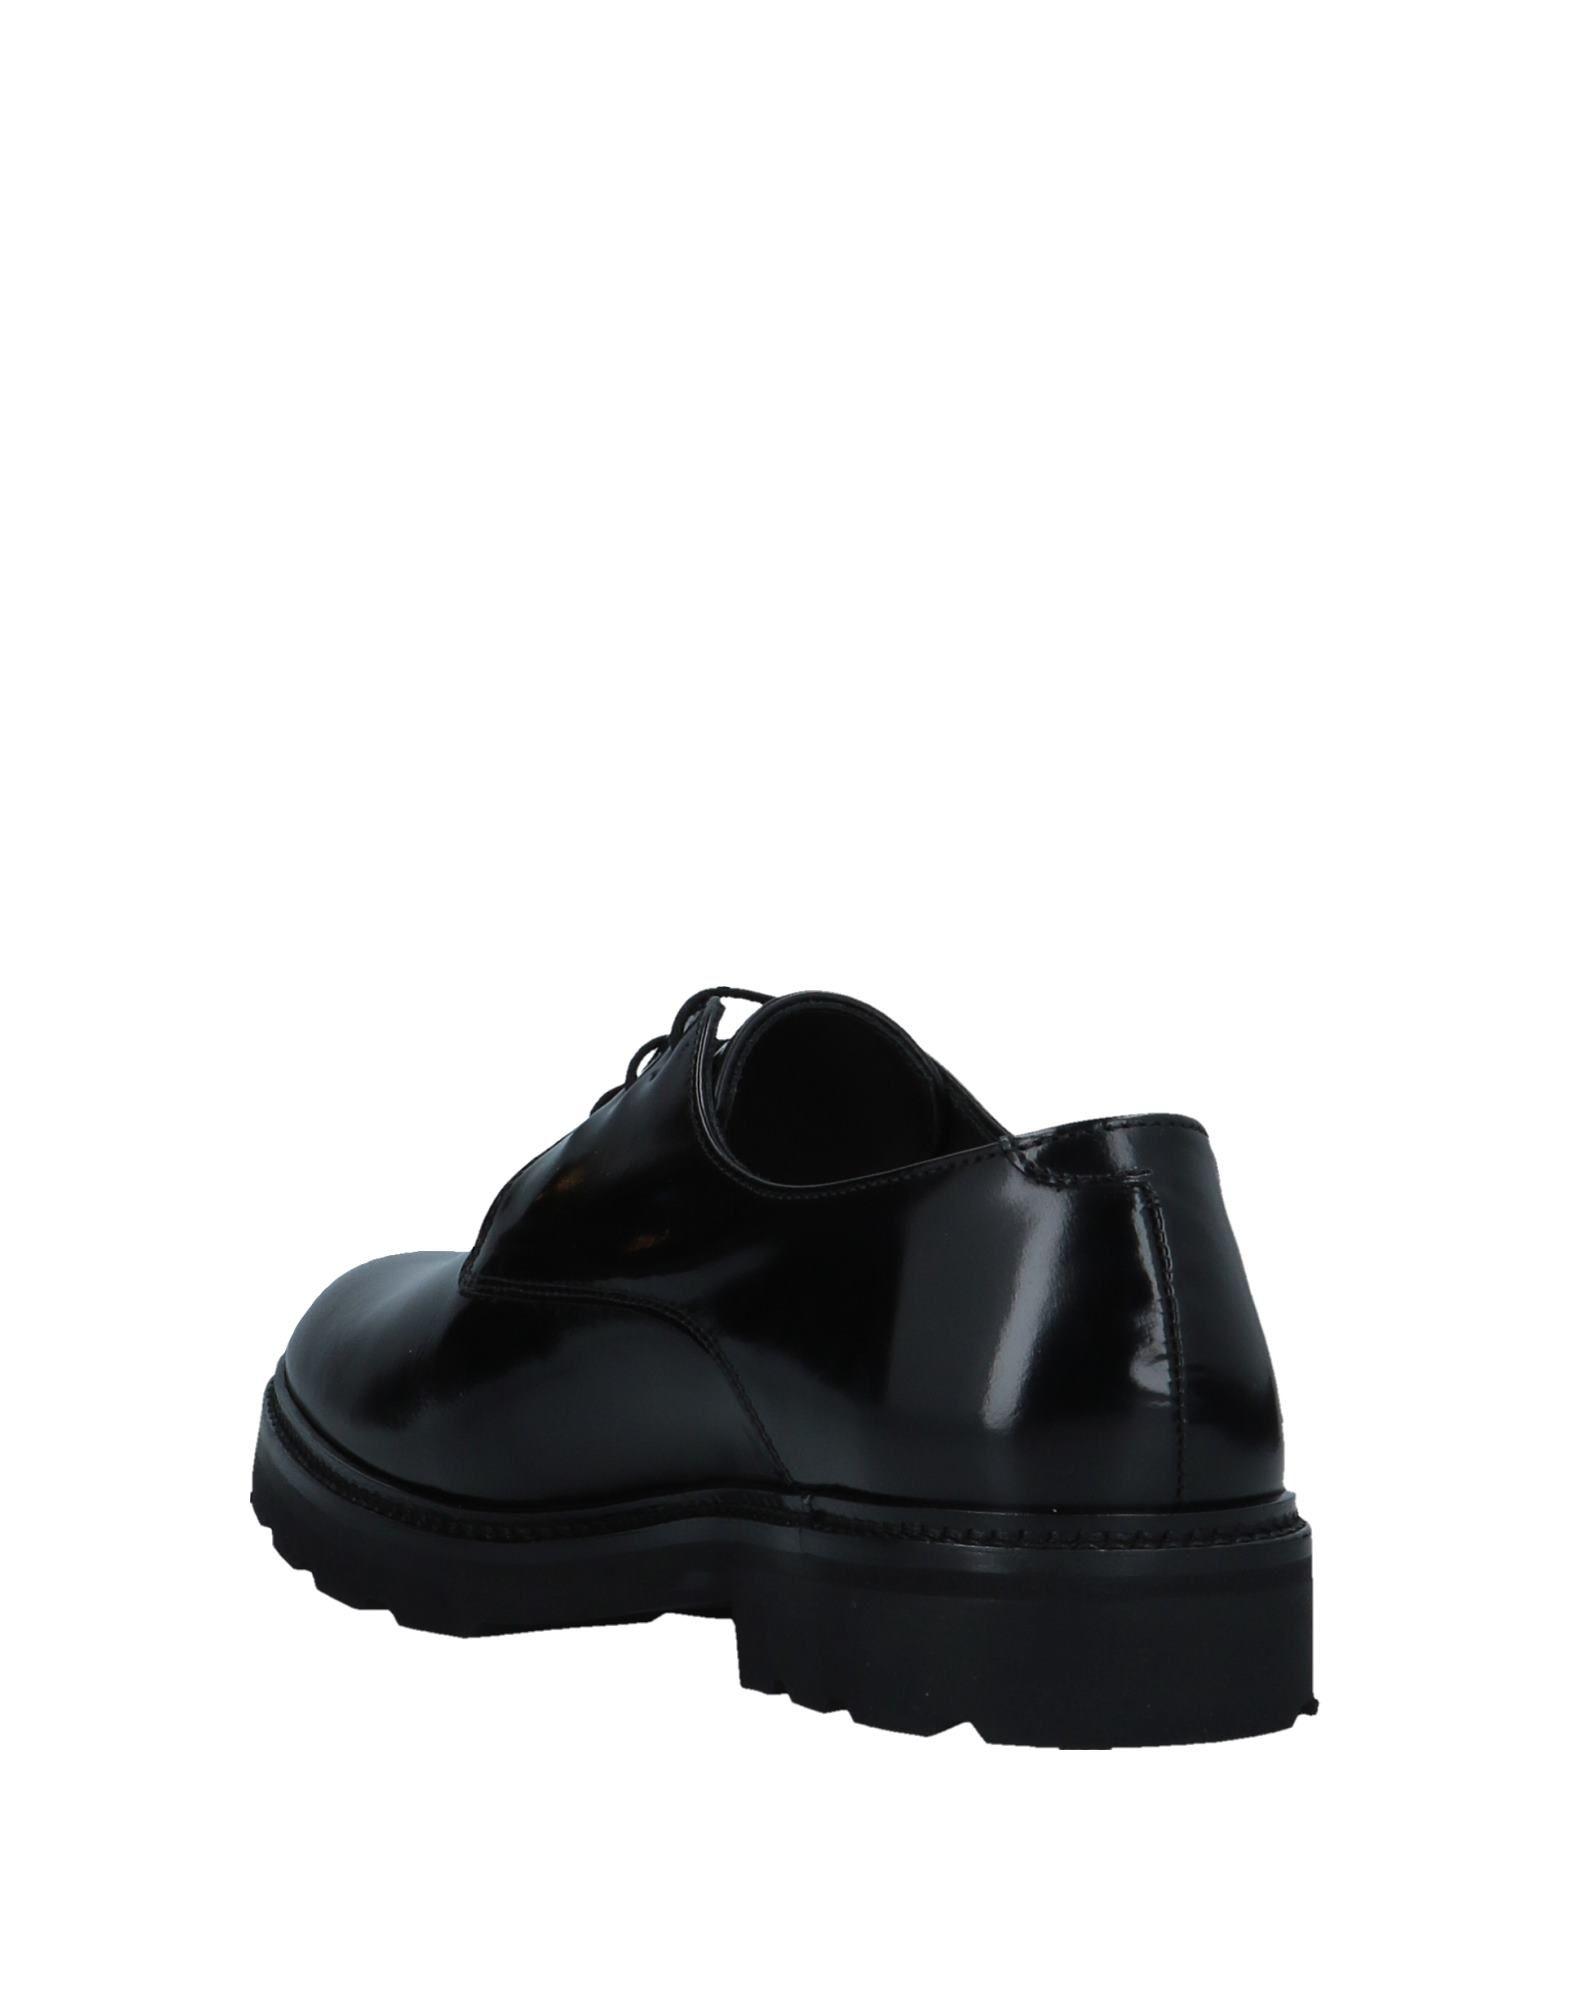 Royal Republiq Gute Schnürschuhe Herren  11543369HK Gute Republiq Qualität beliebte Schuhe a2b35b